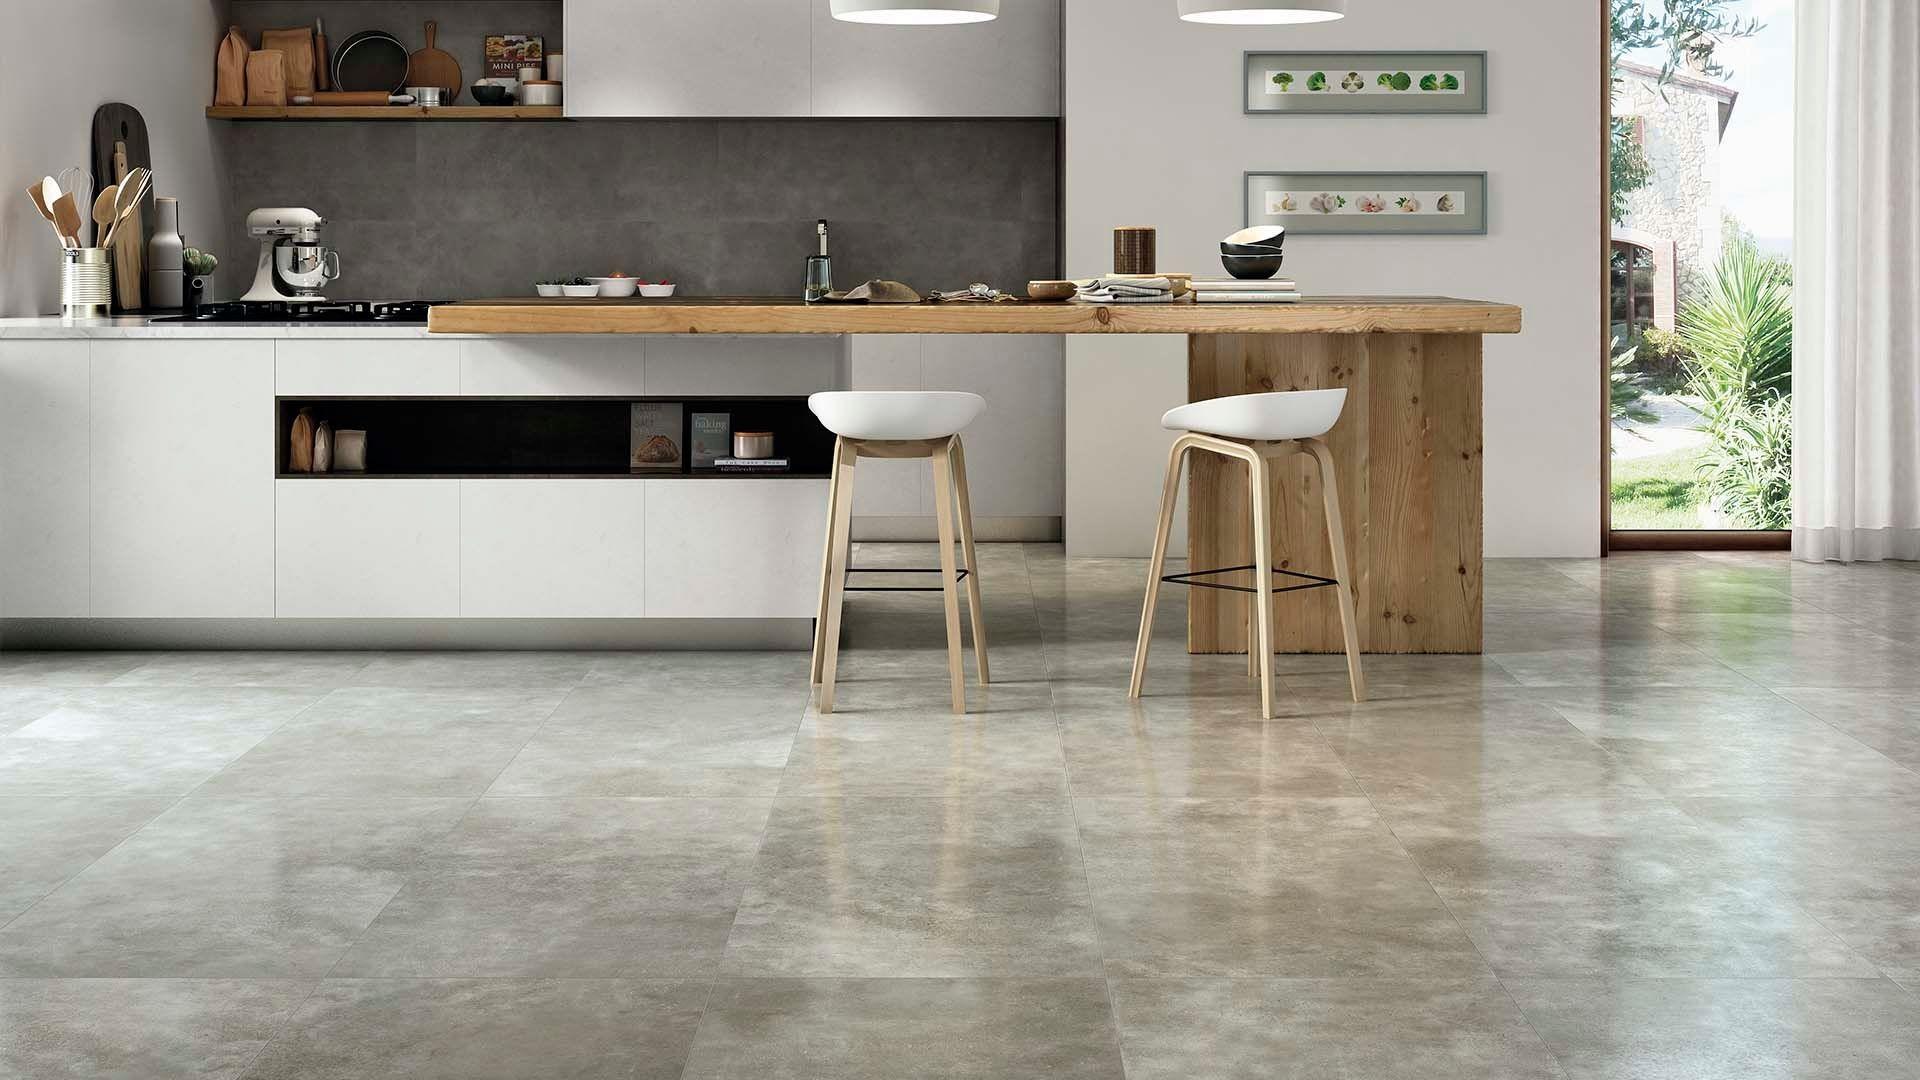 Muebles cocina Toledo